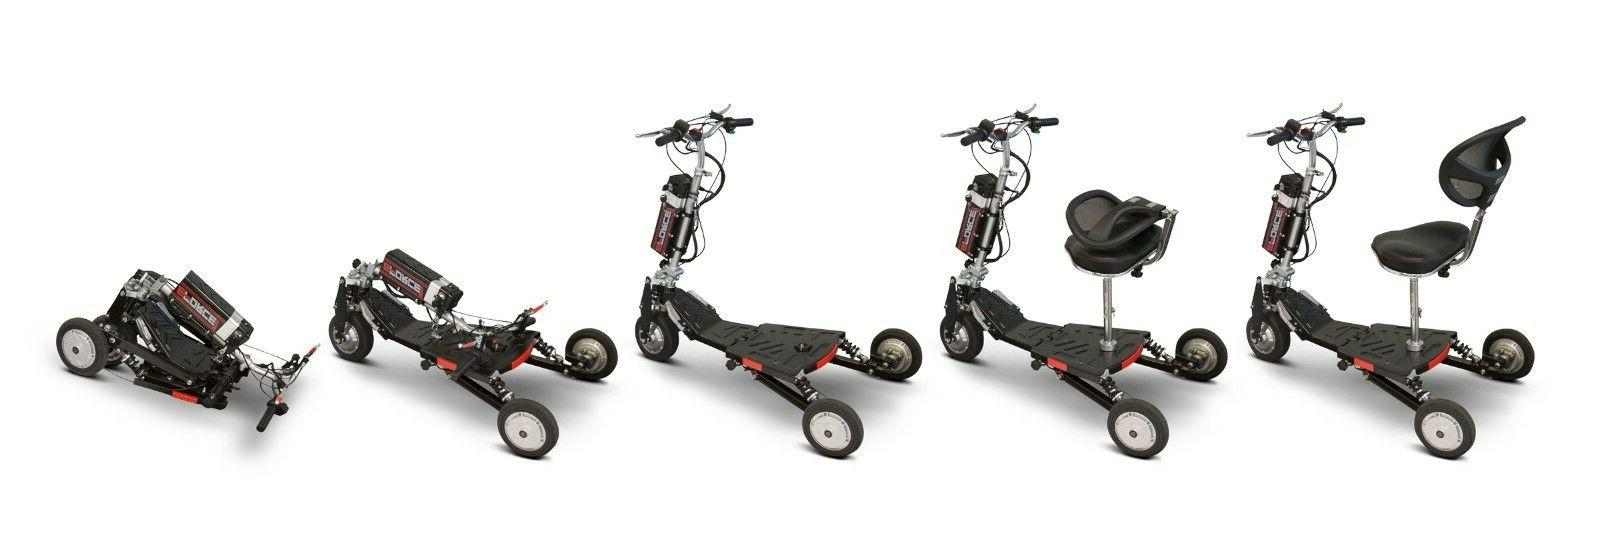 EWheels Eforce1 Folding Travel Scooter, 325 lb.